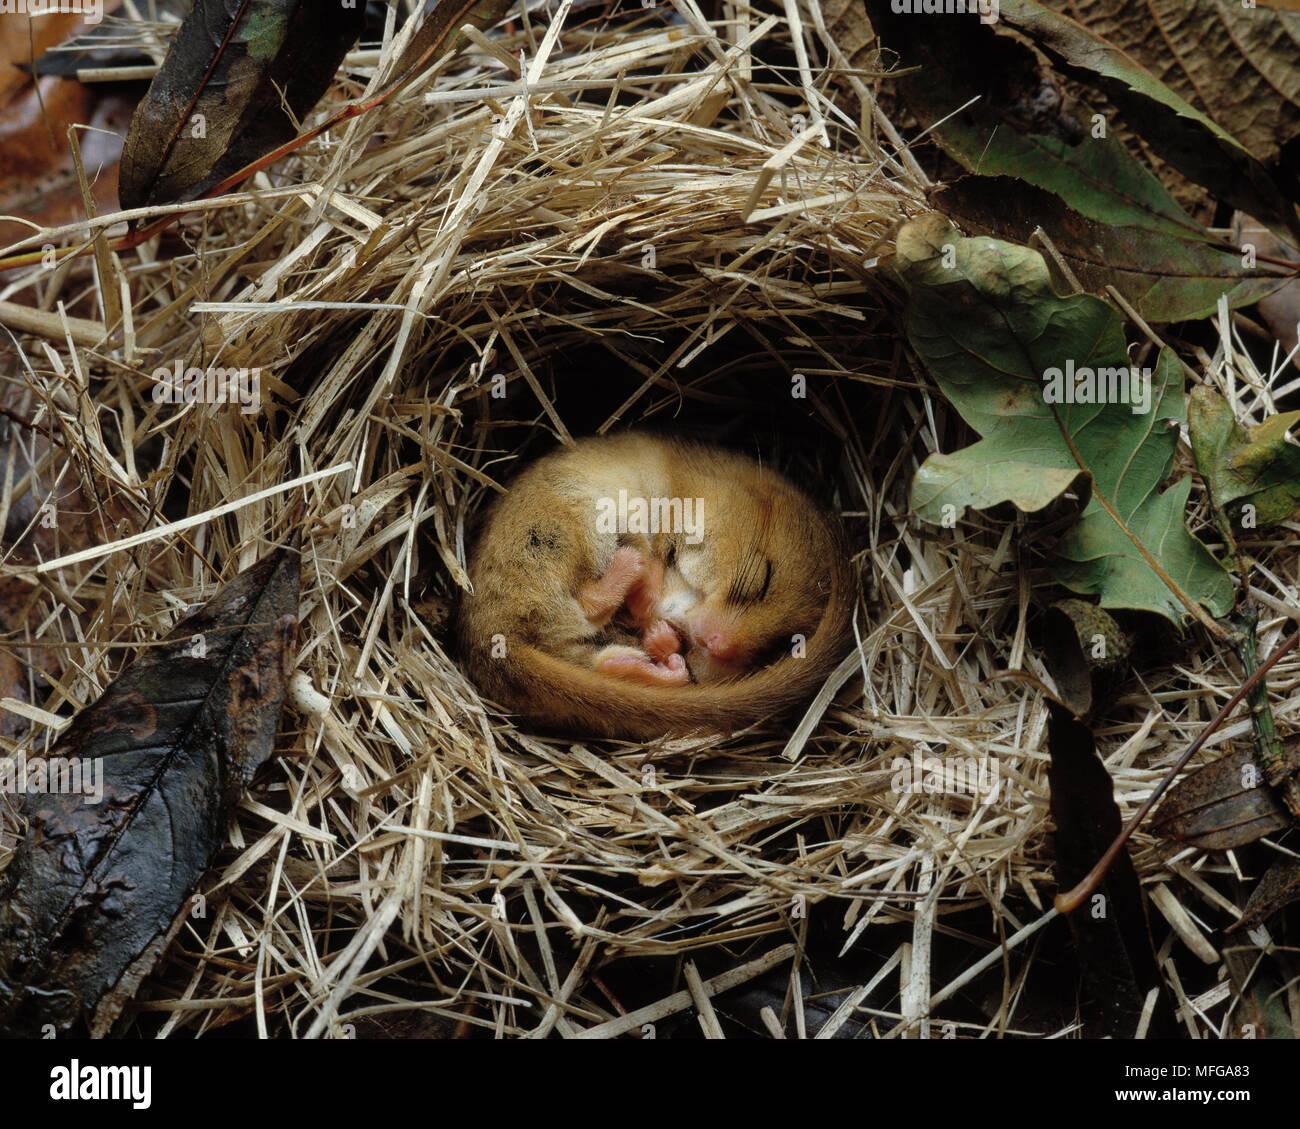 HAZEL DORMOUSE Muscardinus avellanarius hibernating - Stock Image